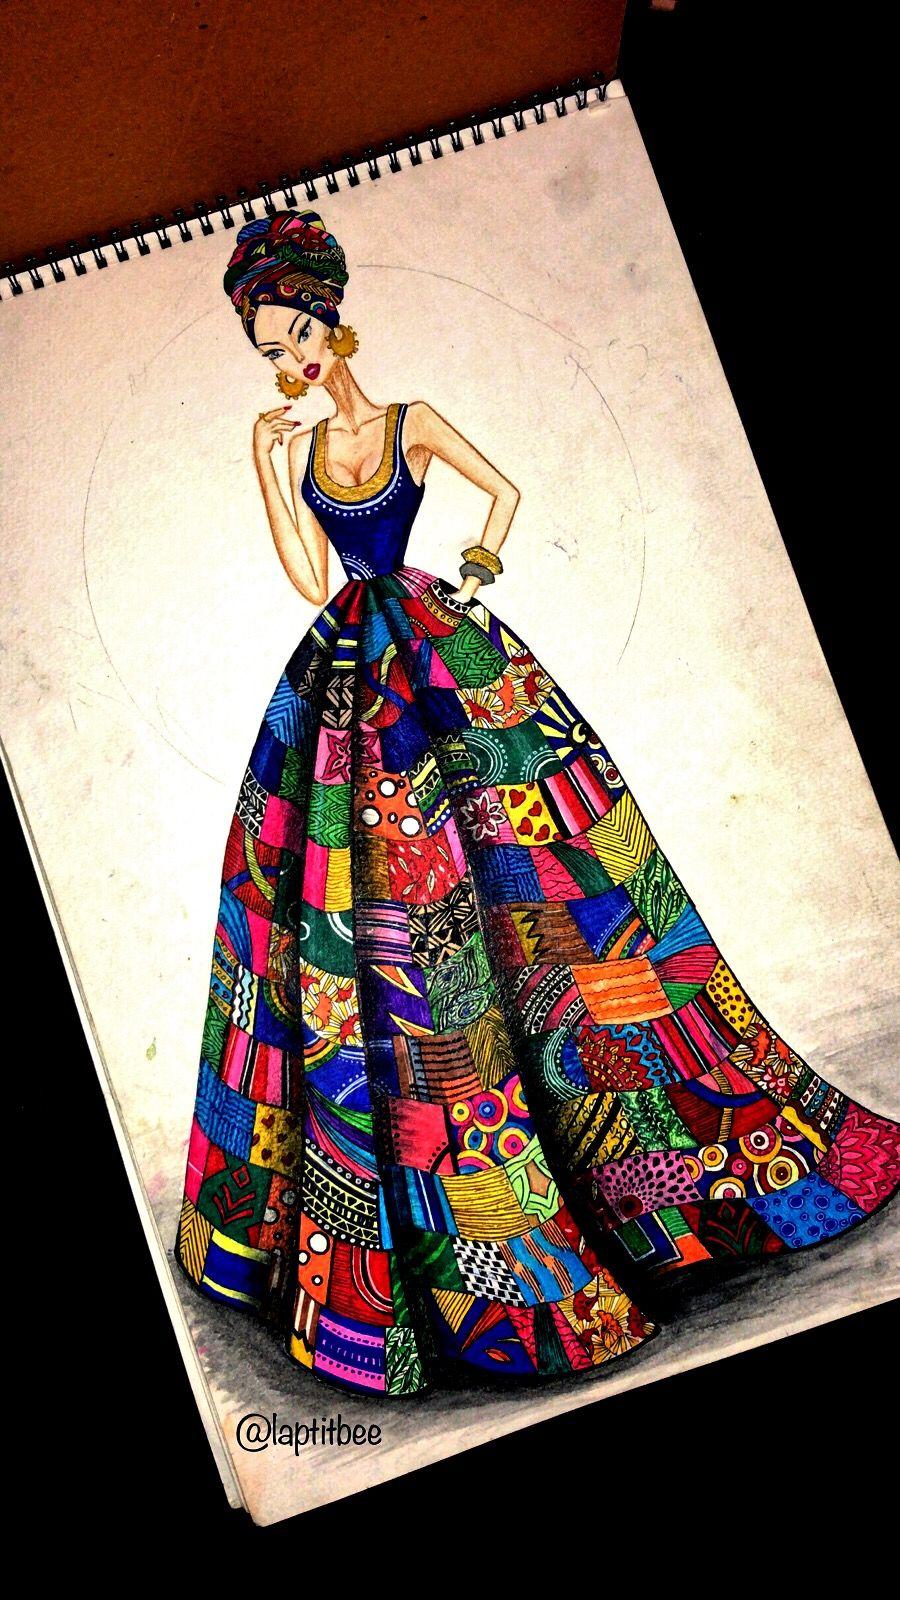 db5568e0 thebohoprincess @thebohoprincess | Fashion Design in 2019 | Fashion ...